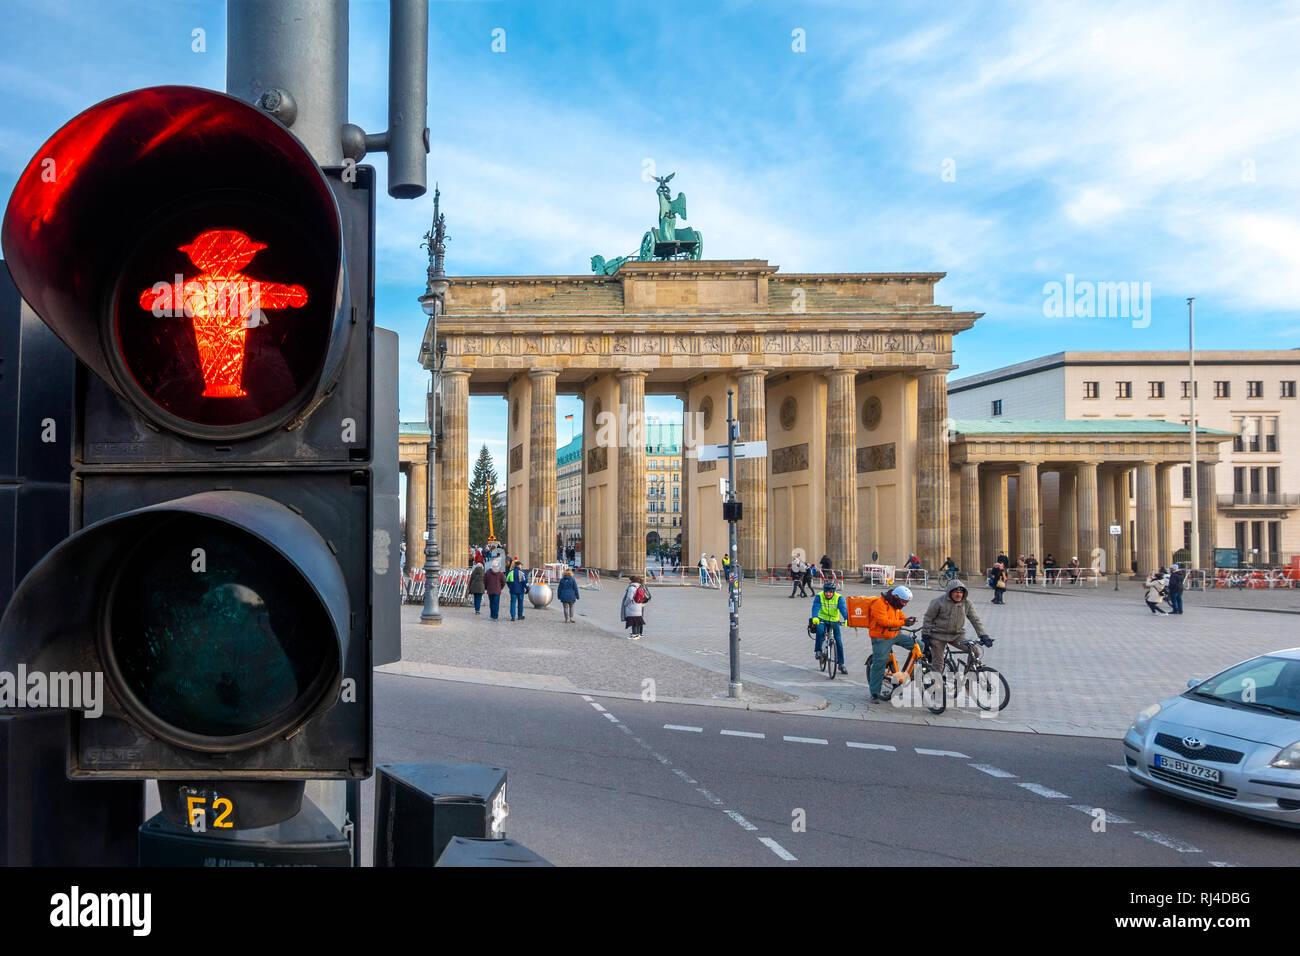 Ampelmann Berliner Ampelmännchen Fußgängerampel Beleuchtung Fußgängerüberweg Platz des 18. März am Brandenburger Tor Brandenburger Tor Stockfoto